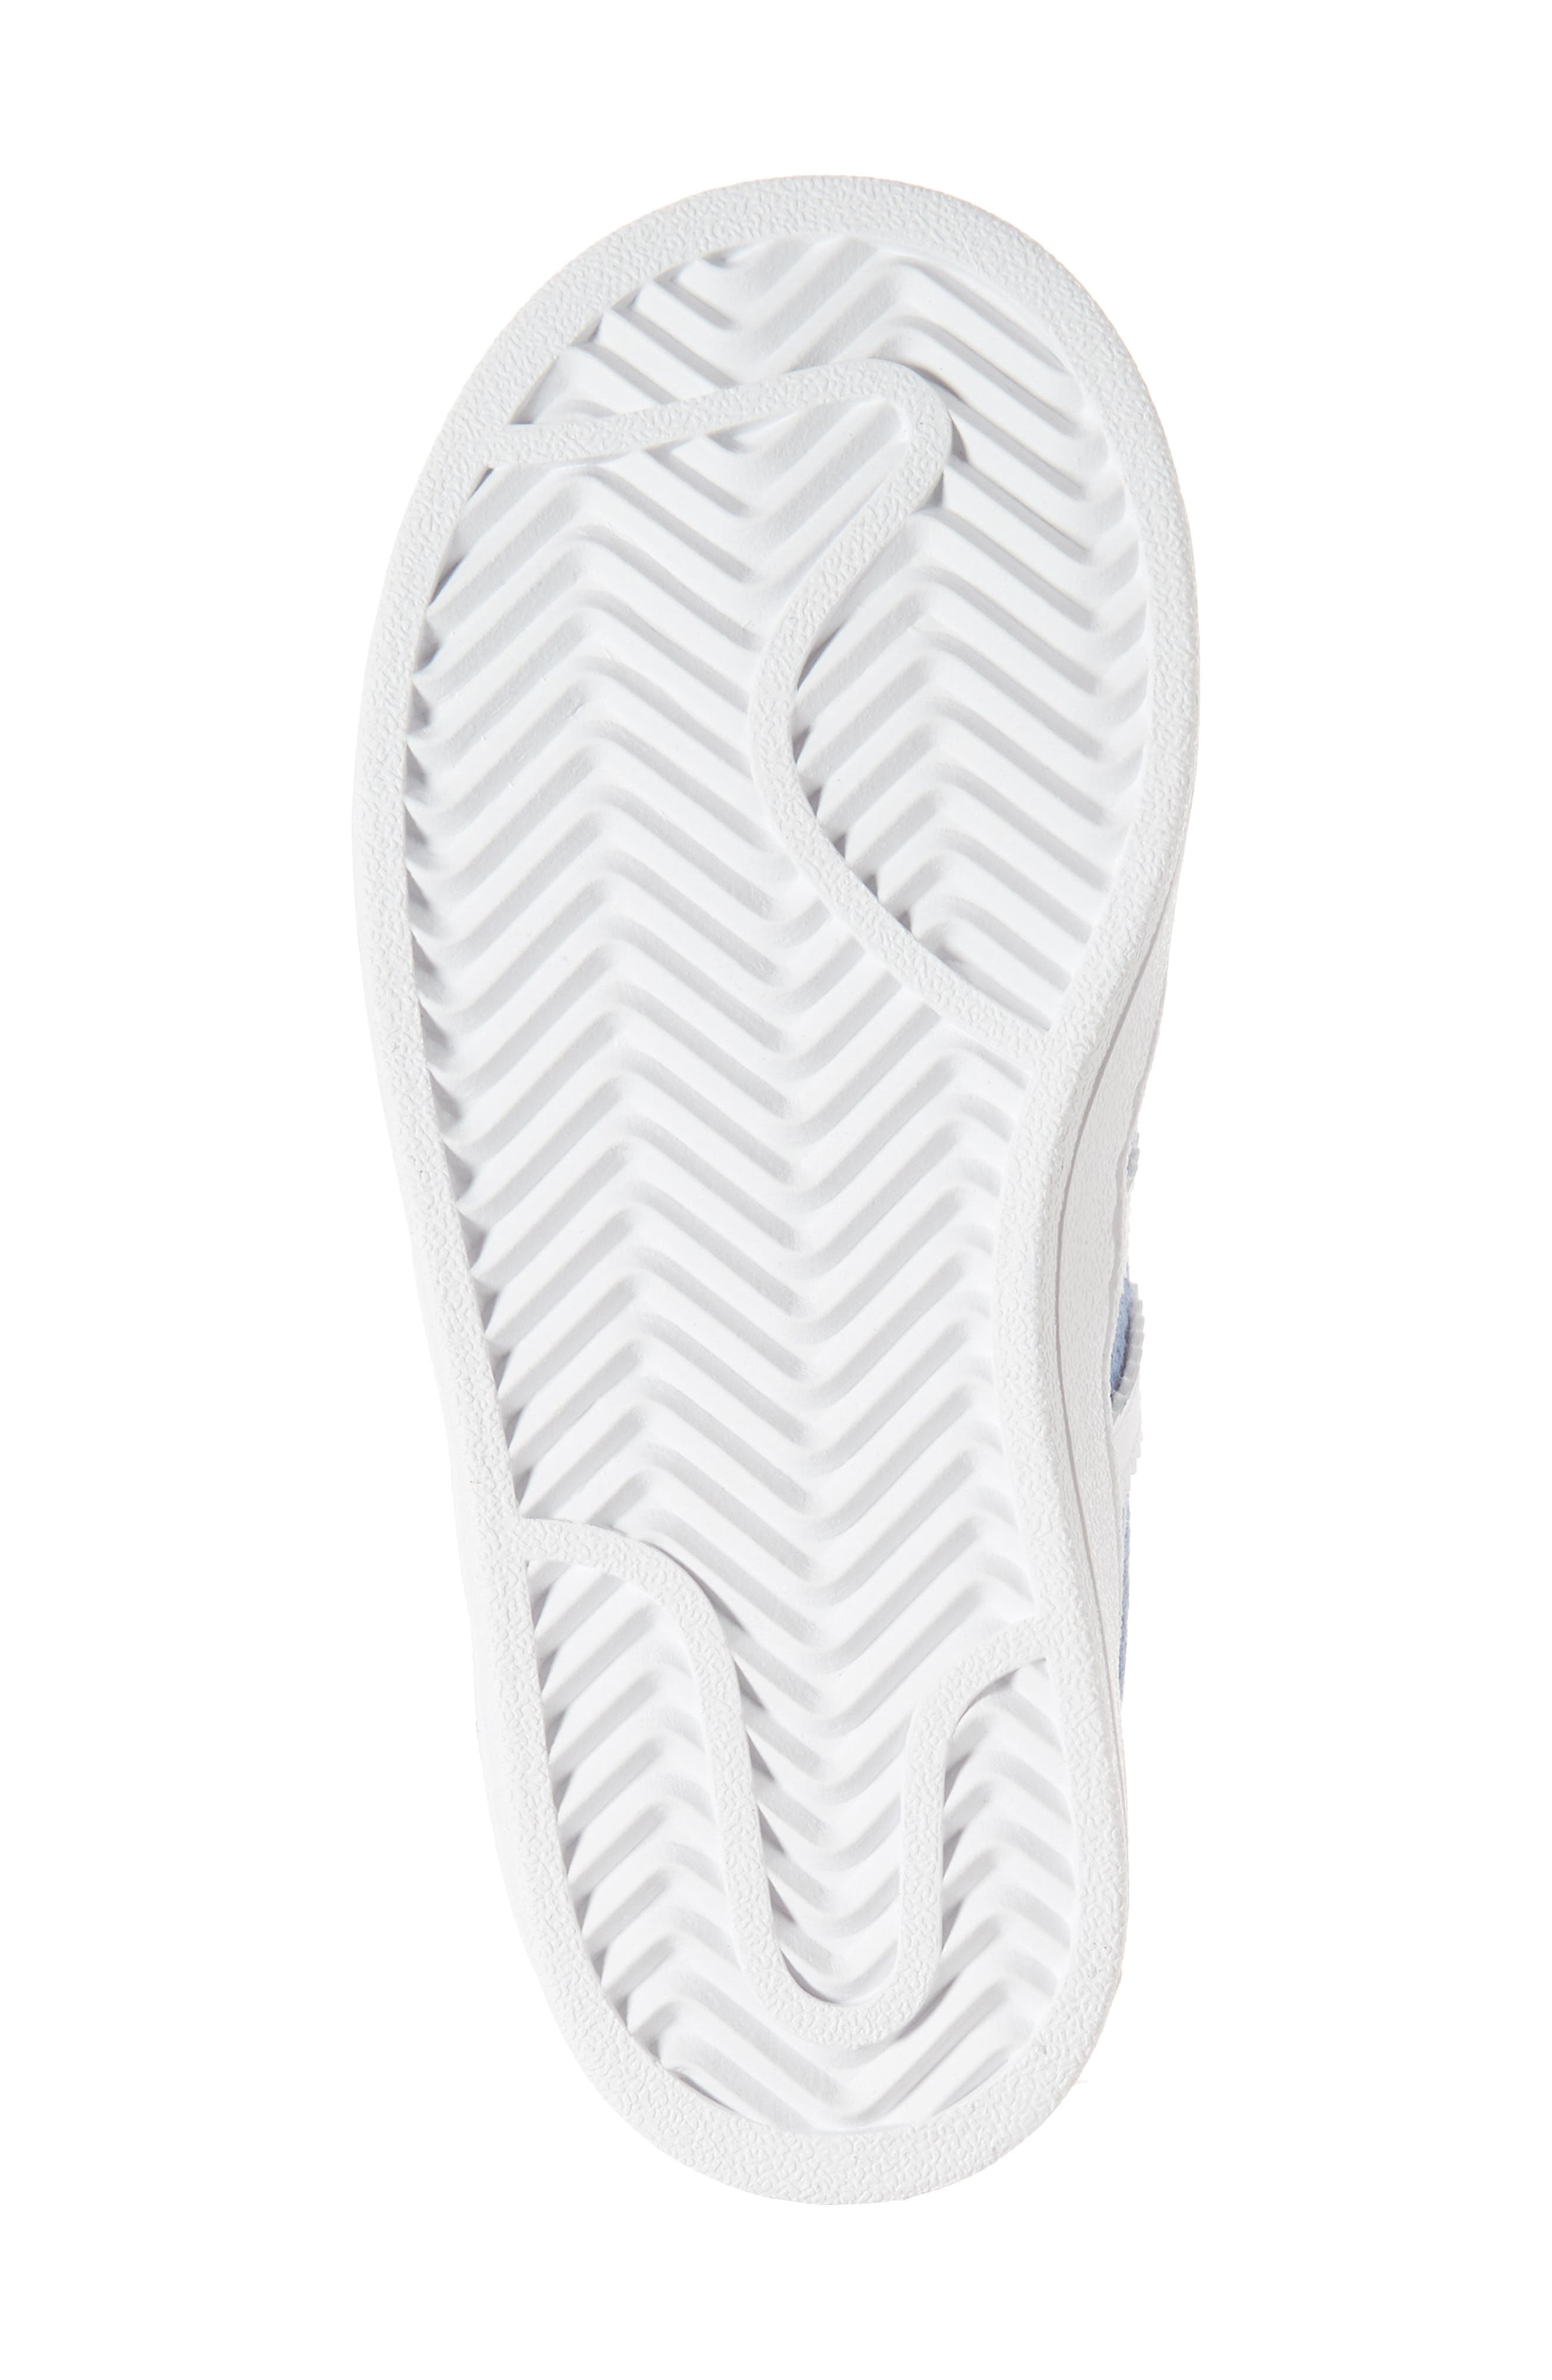 Campus J Sneaker,                             Alternate thumbnail 5, color,                             Trace Royal / White / White